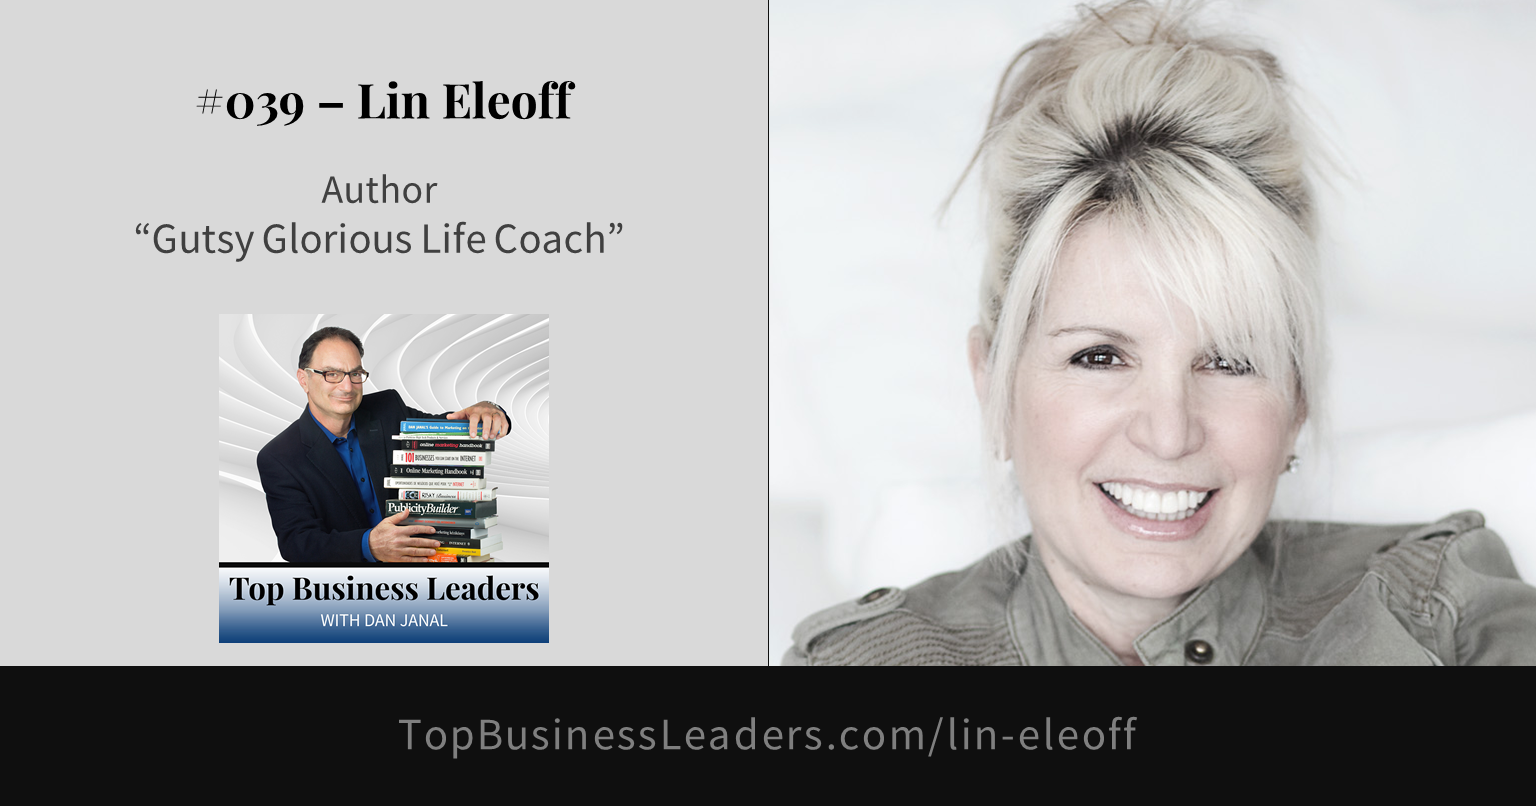 lin-eleoff-author-gutsy-glorious-life-coach